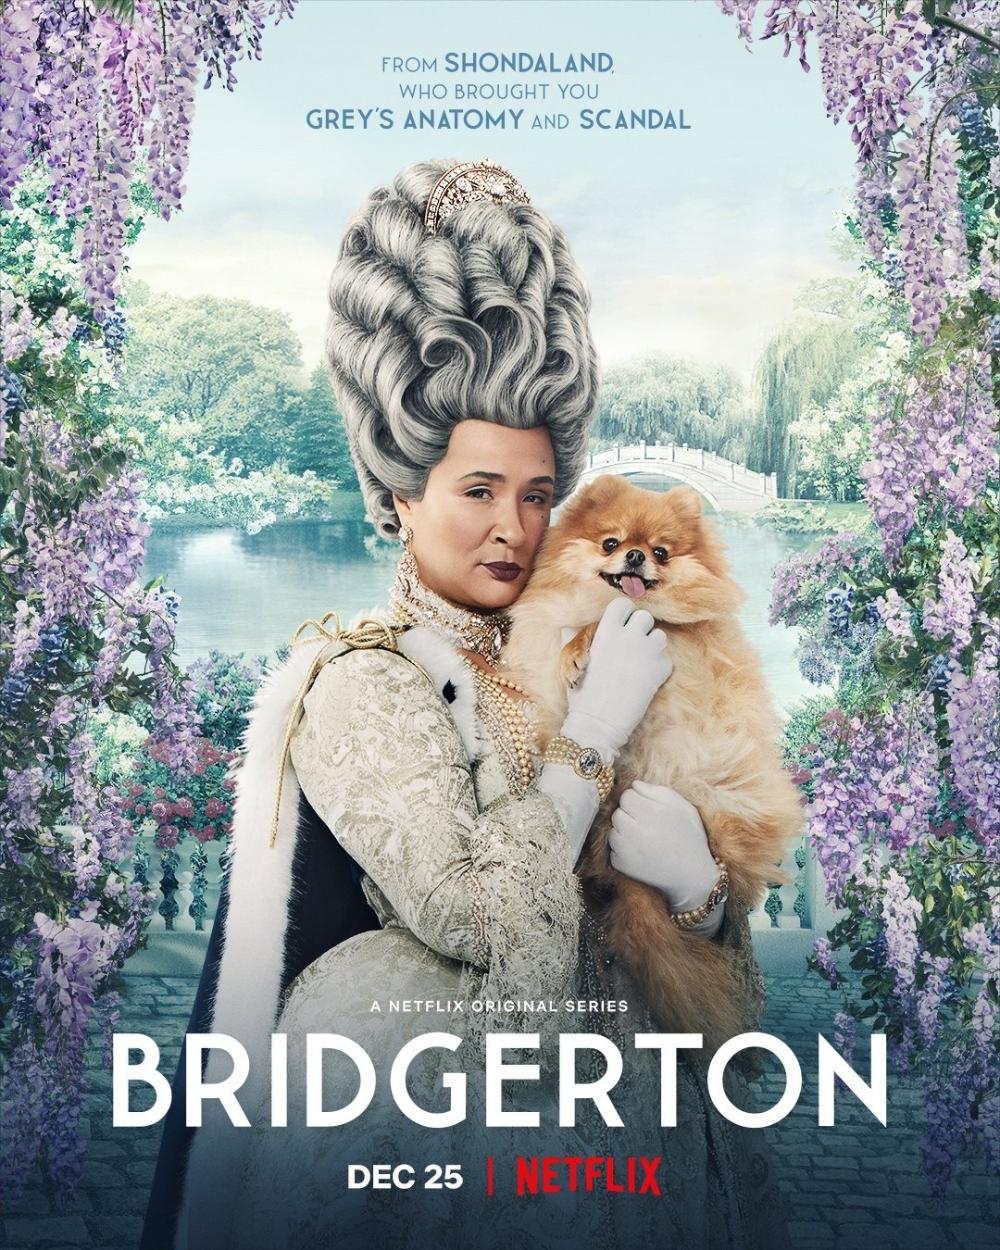 The Bridgerton